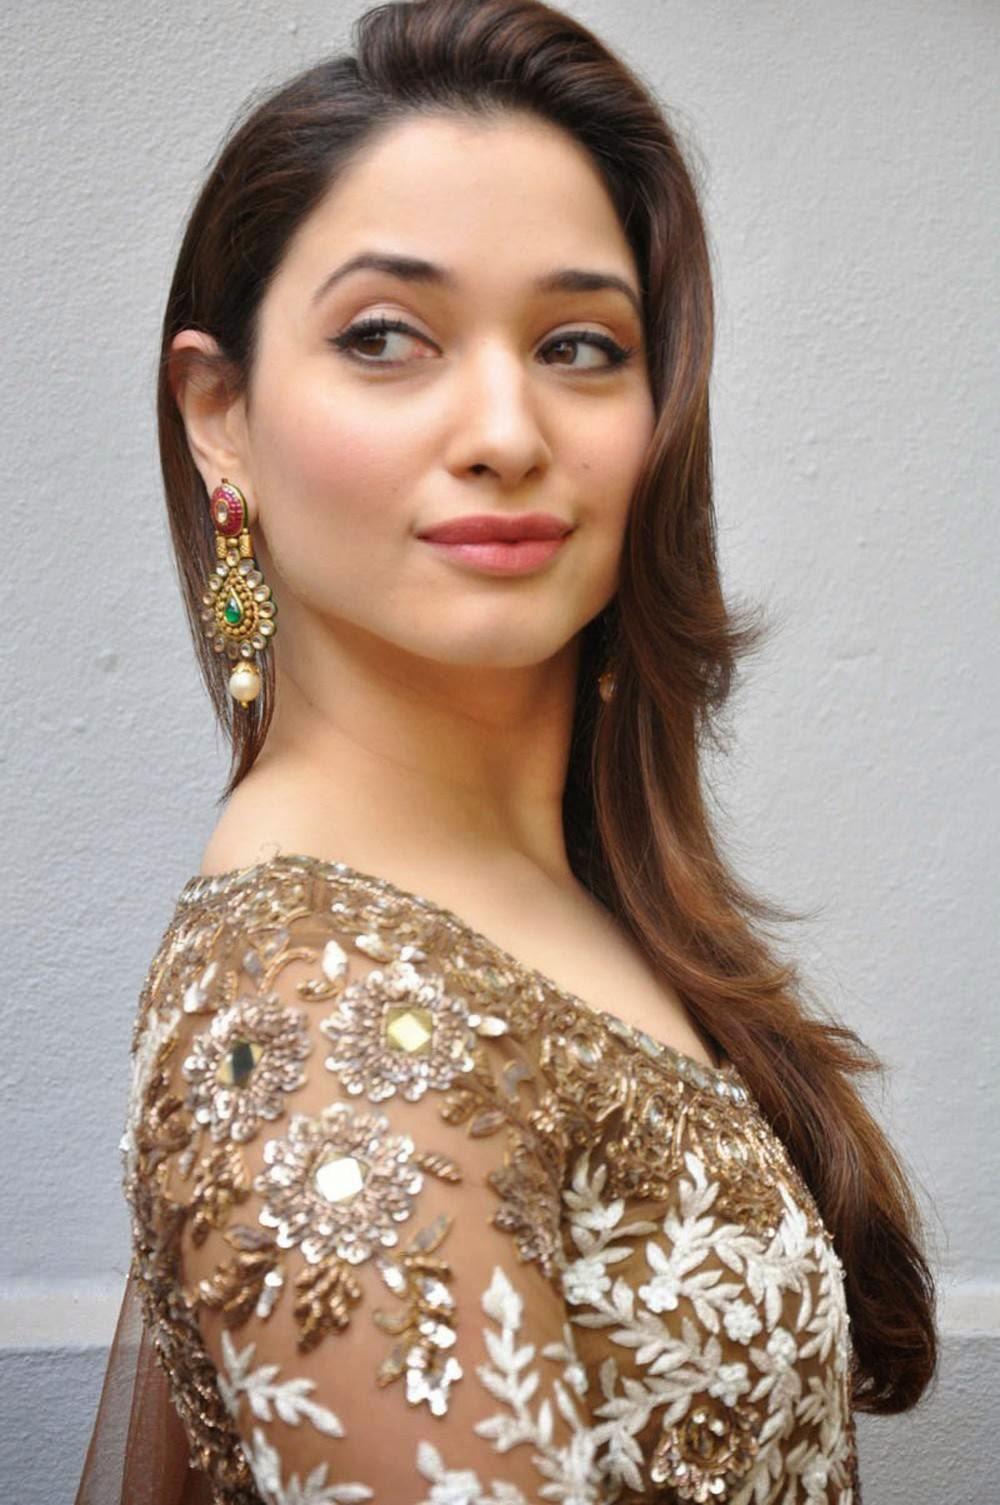 Tamanna Bhatia Images Tamanna Hd Wallpaper And Background: Tamanna Bhatia Stills At Bengal Tiger Movie Launch